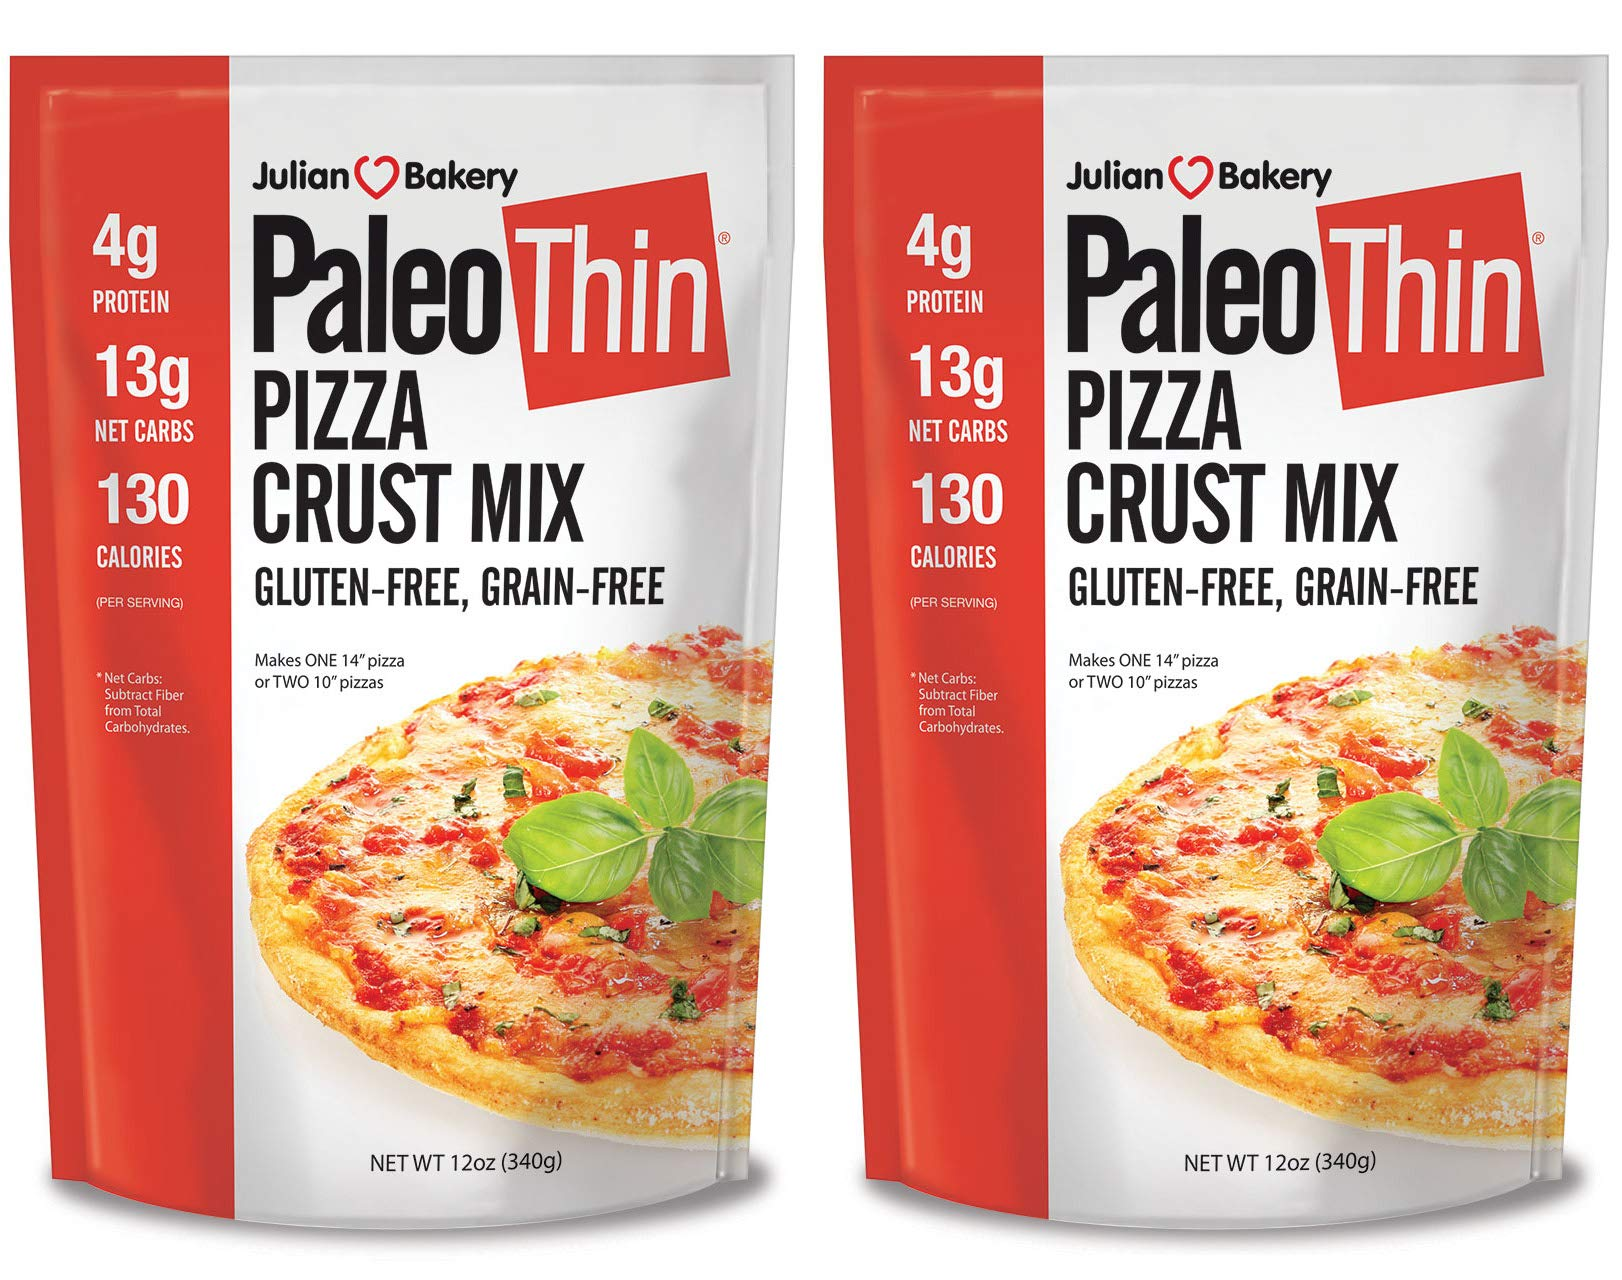 Paleo Pizza Crust Mix (2 Mix Pack) (Gluten-Free & Grain-Free) 12oz by Julian Bakery